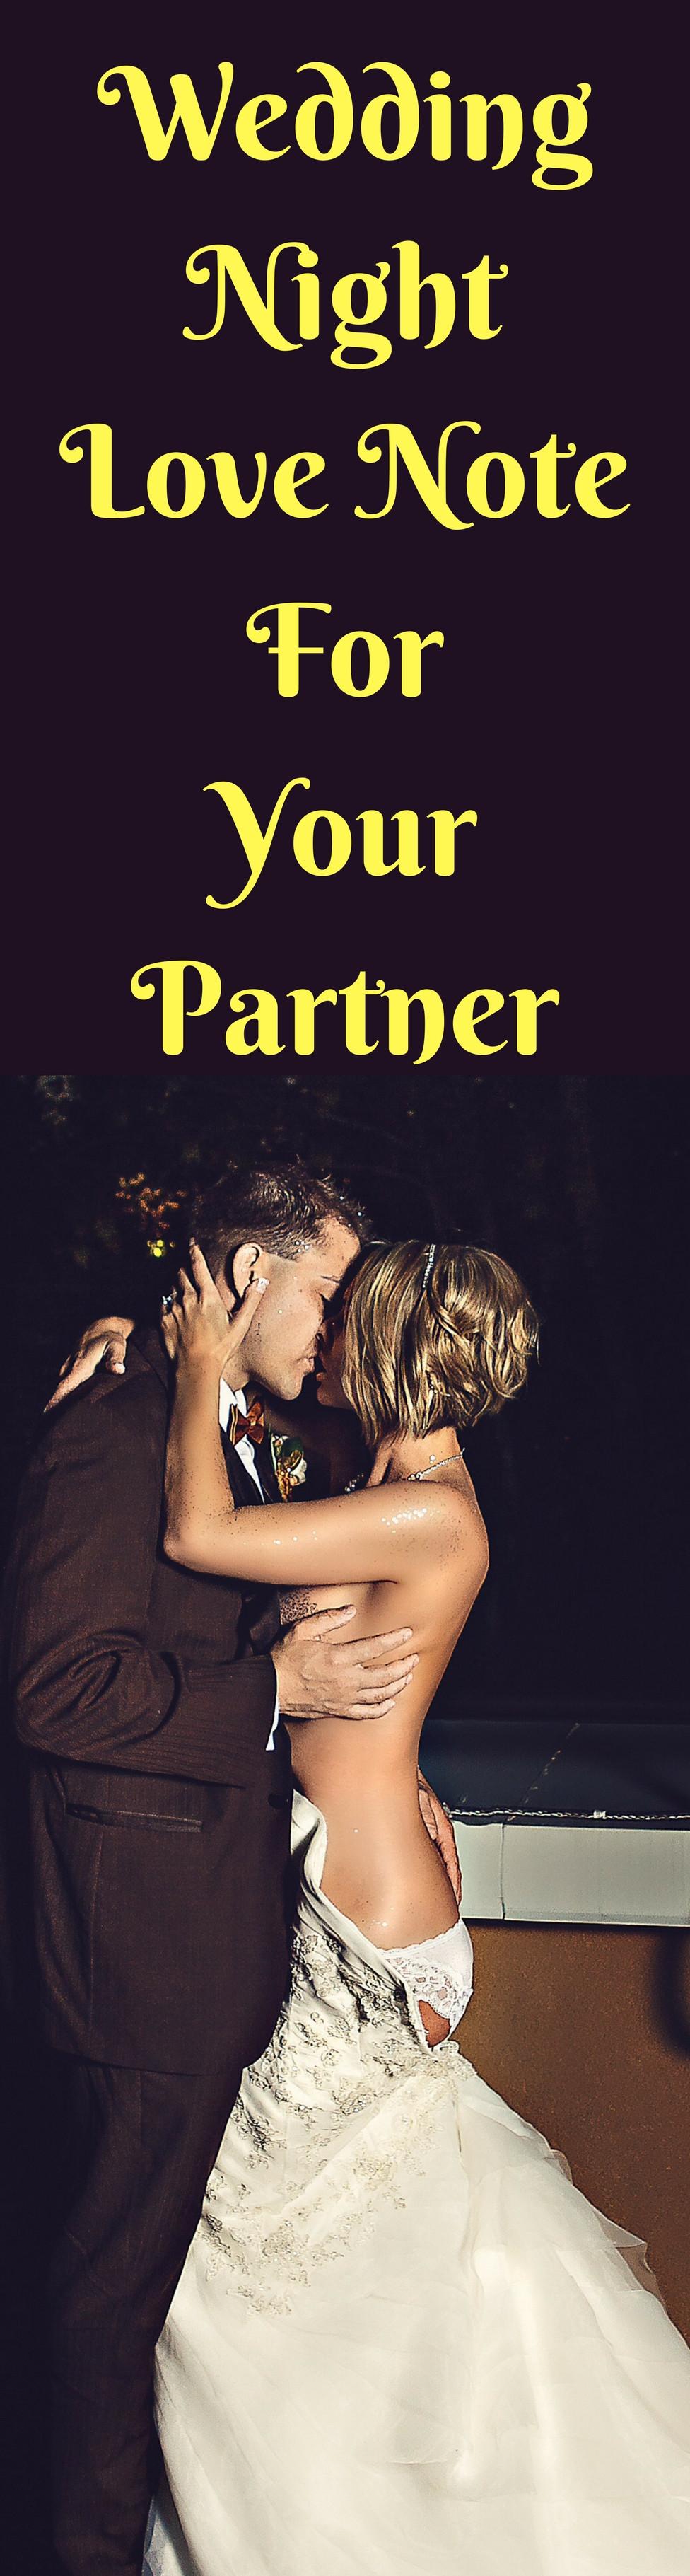 Sta Cr Romantic Weddings Wedding Night Night Love